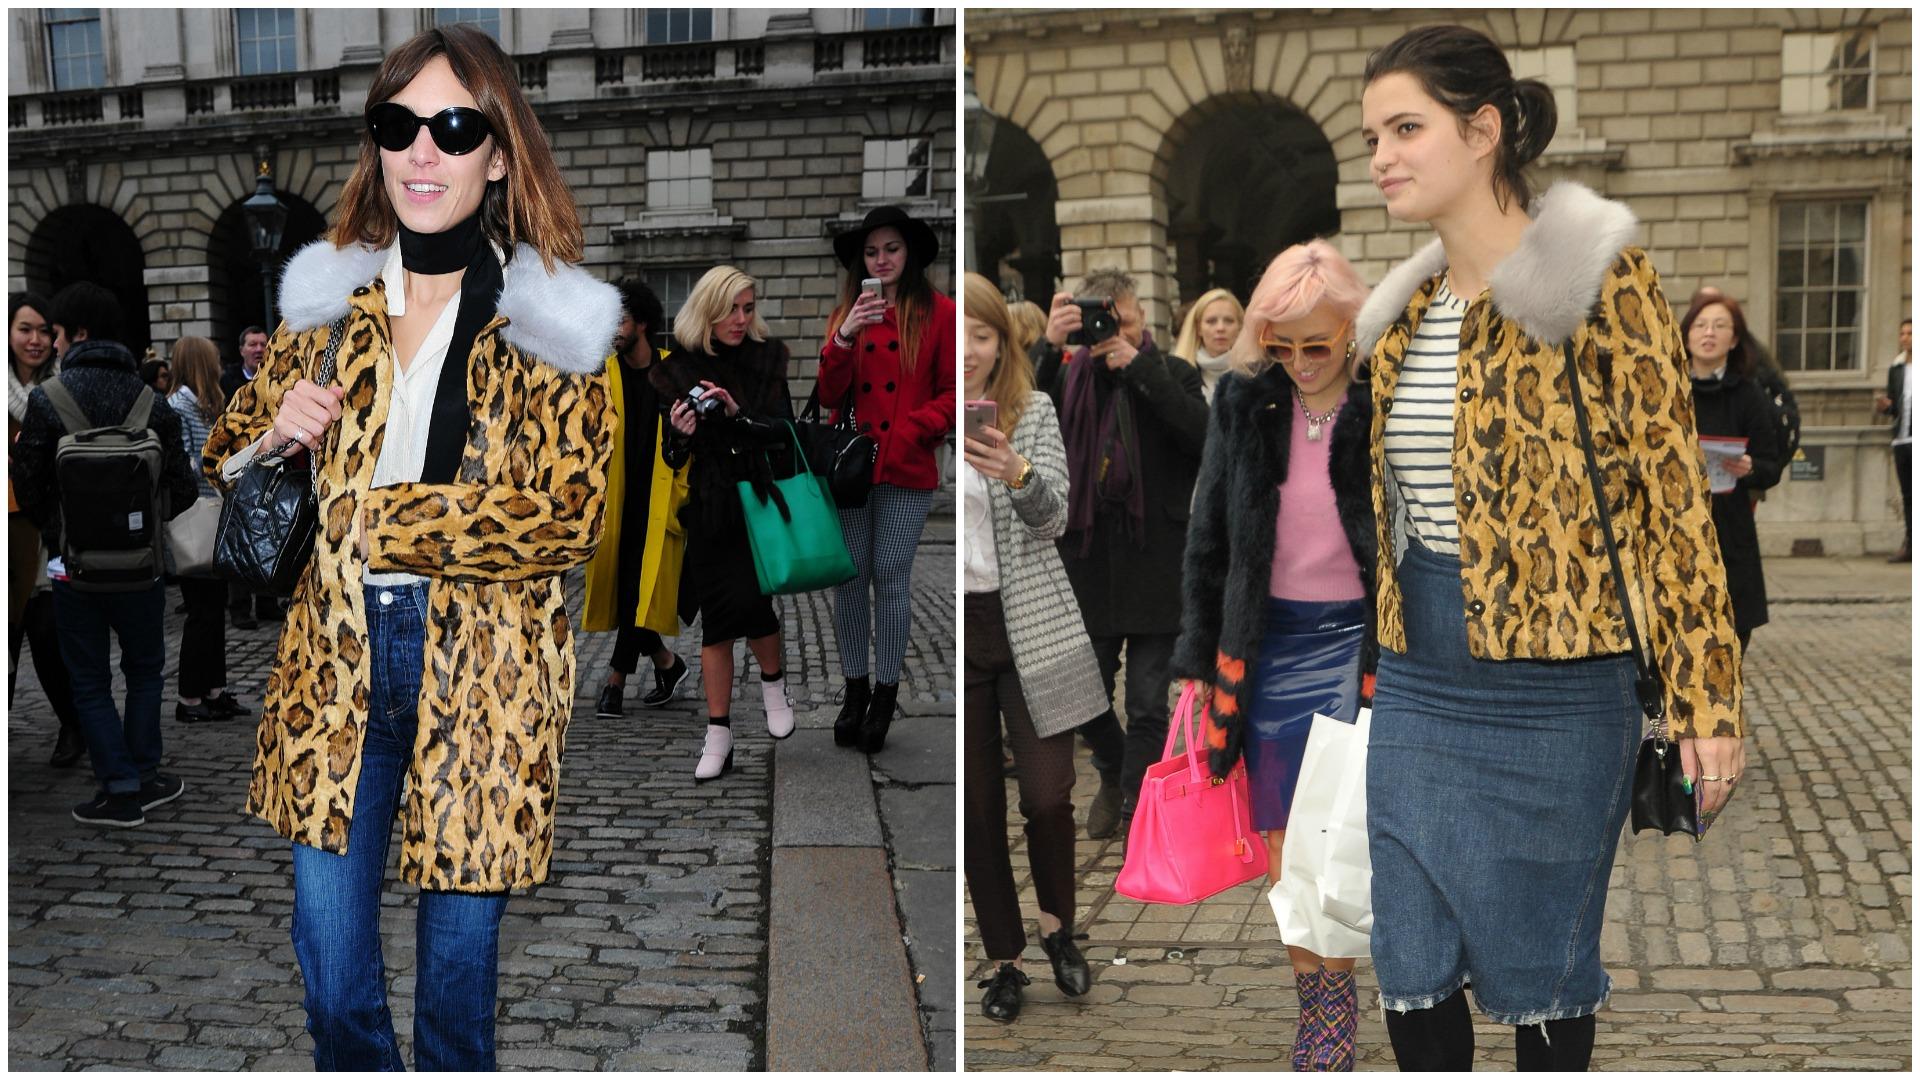 Alexa Chung and Pixie Geldof at London Fashion Week AW15